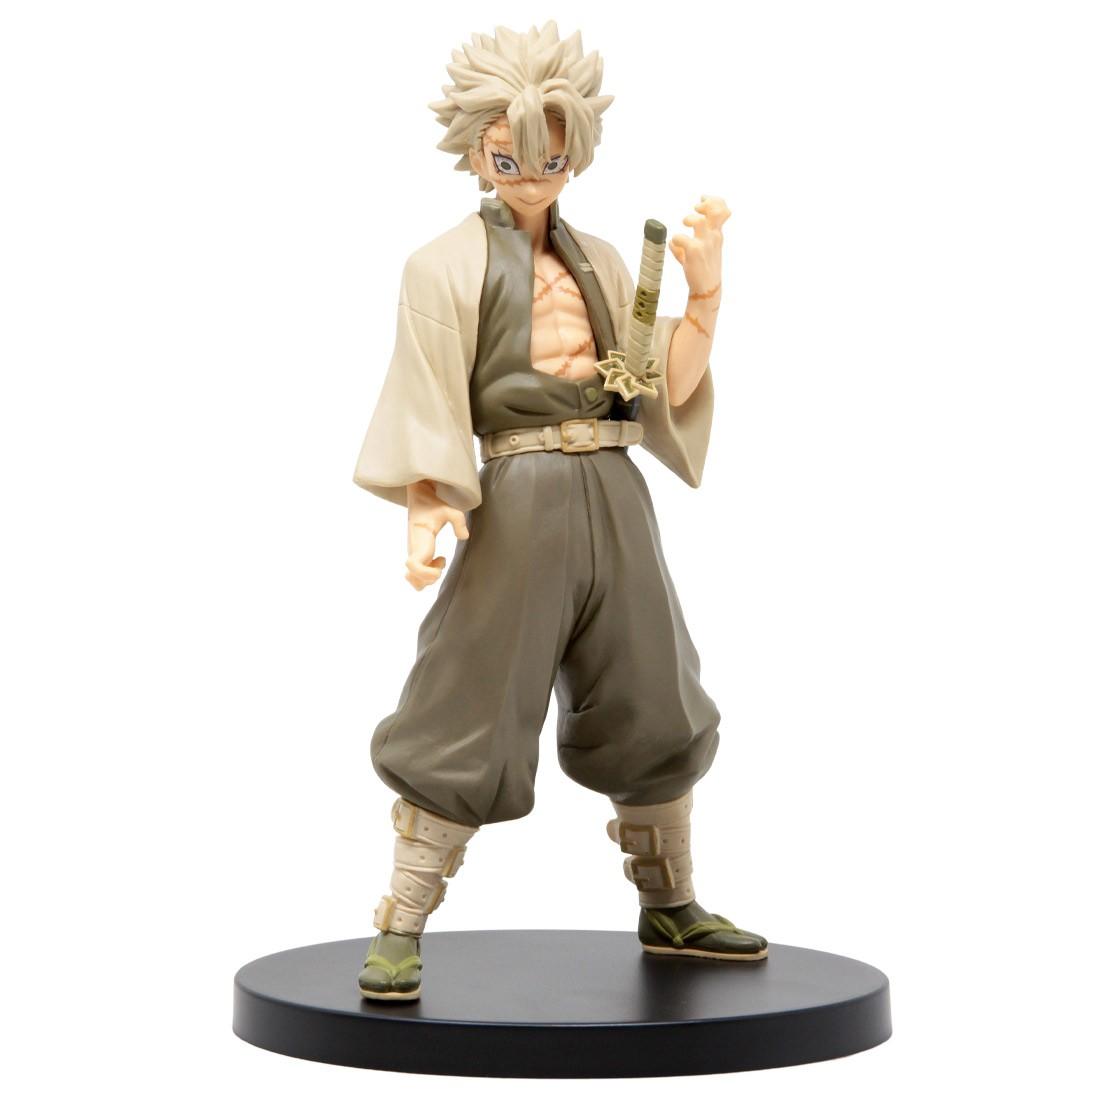 Banpresto Demon Slayer Kimetsu no Yaiba Figure Vol. 15 Sanemi Shinazugawa Figure (olive)